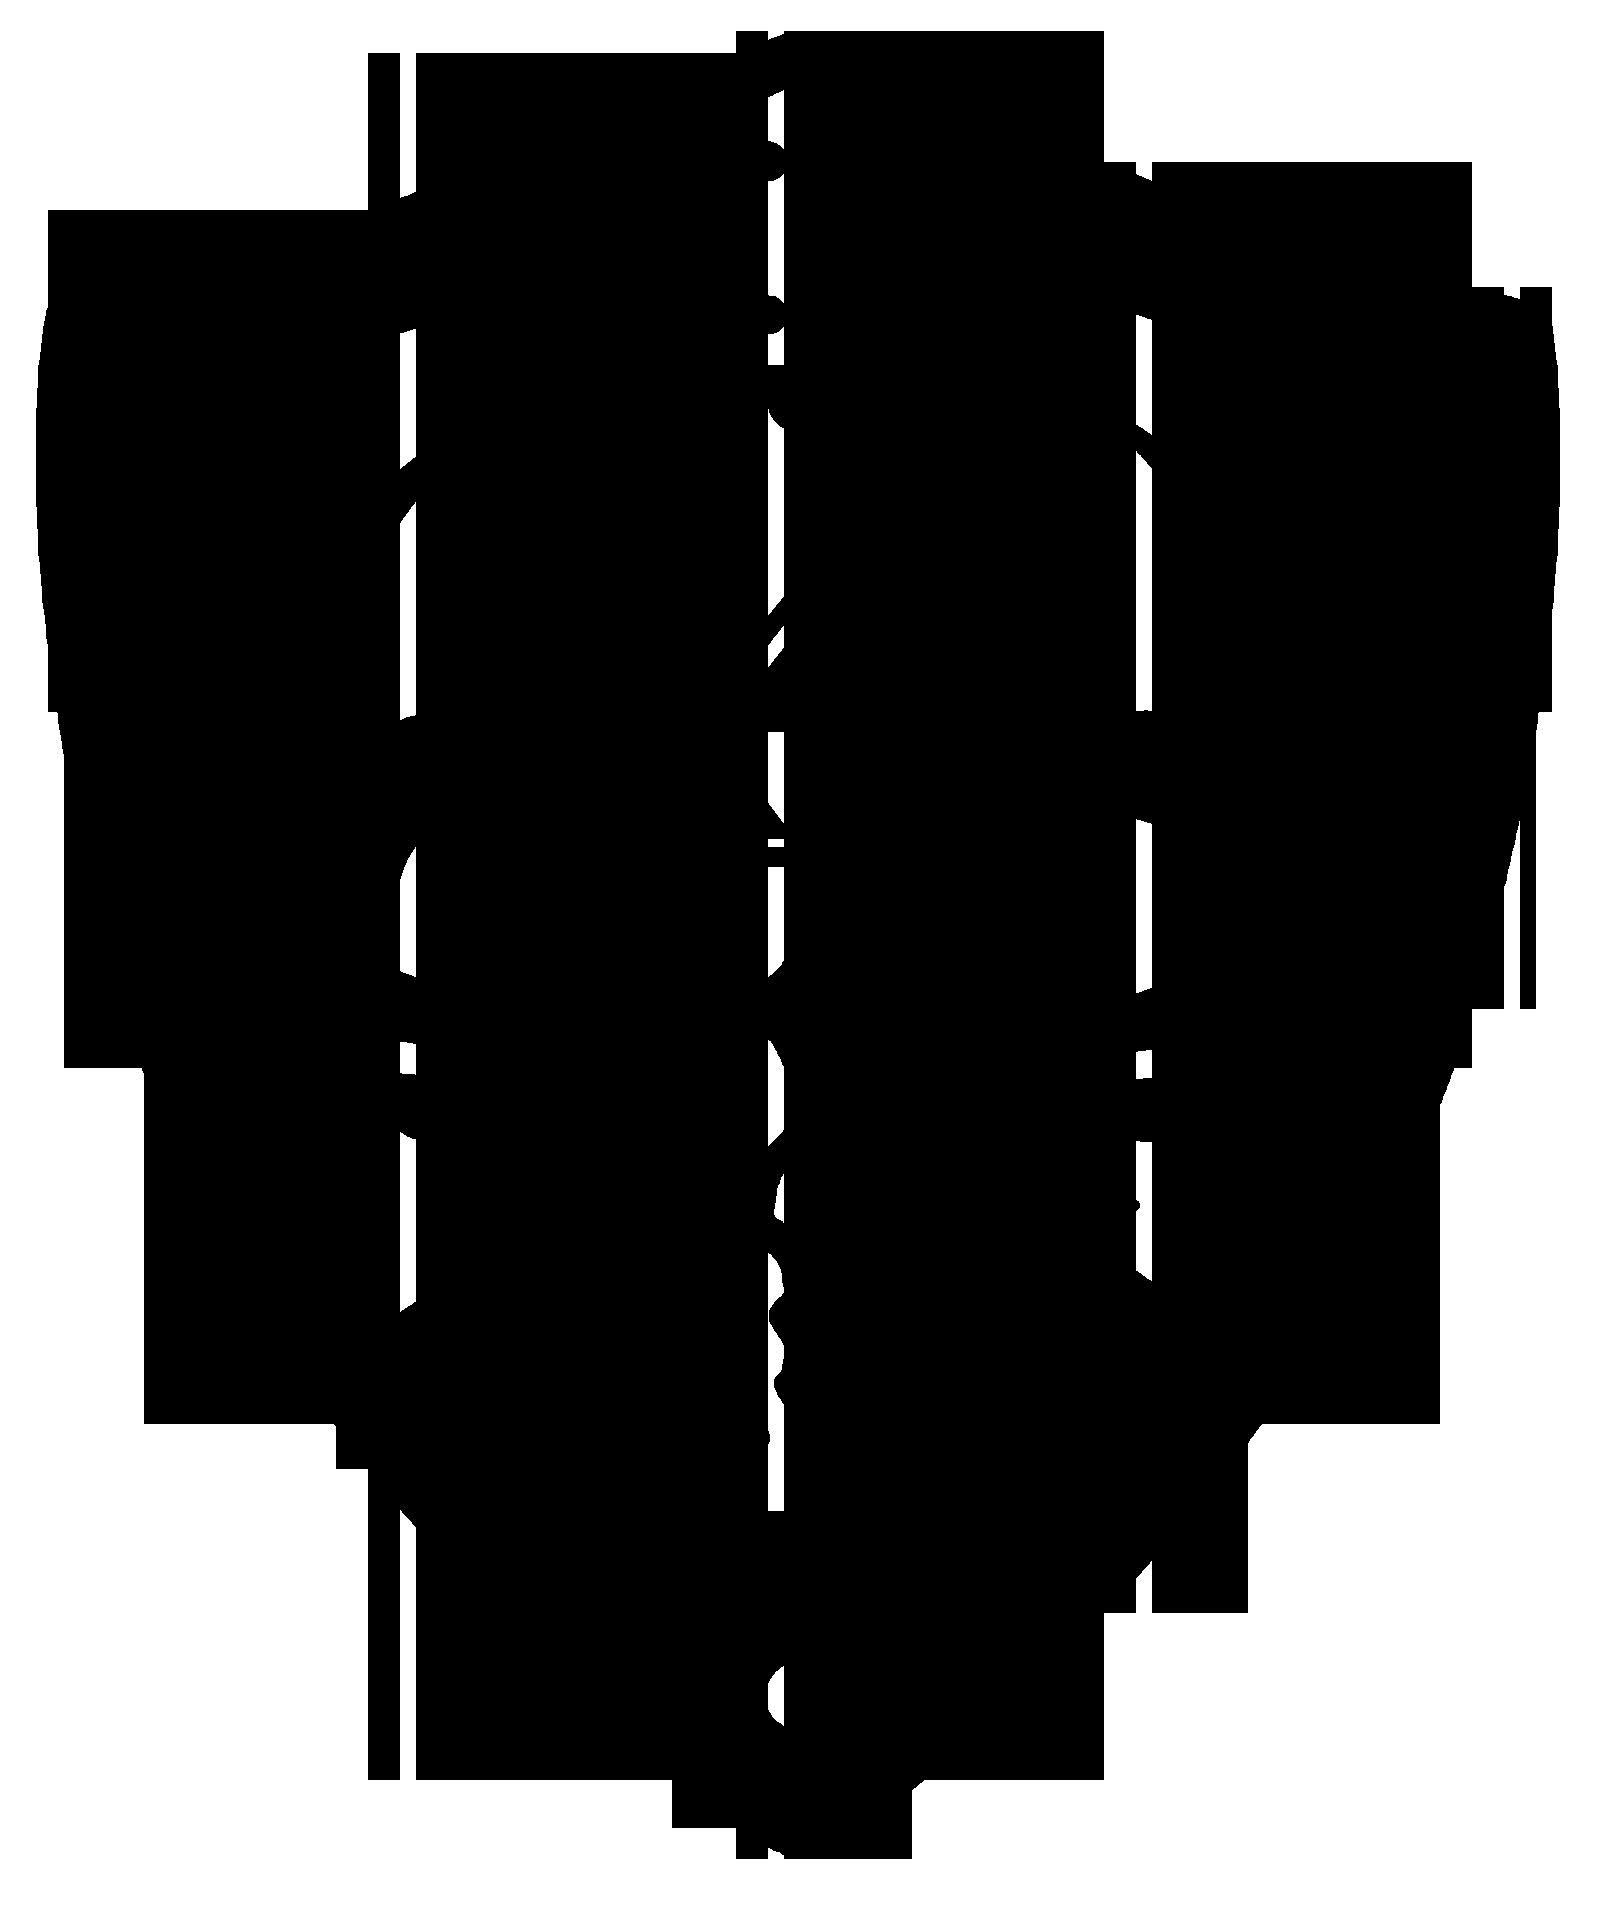 Hylain Shield Template By Gnomesstealsocks